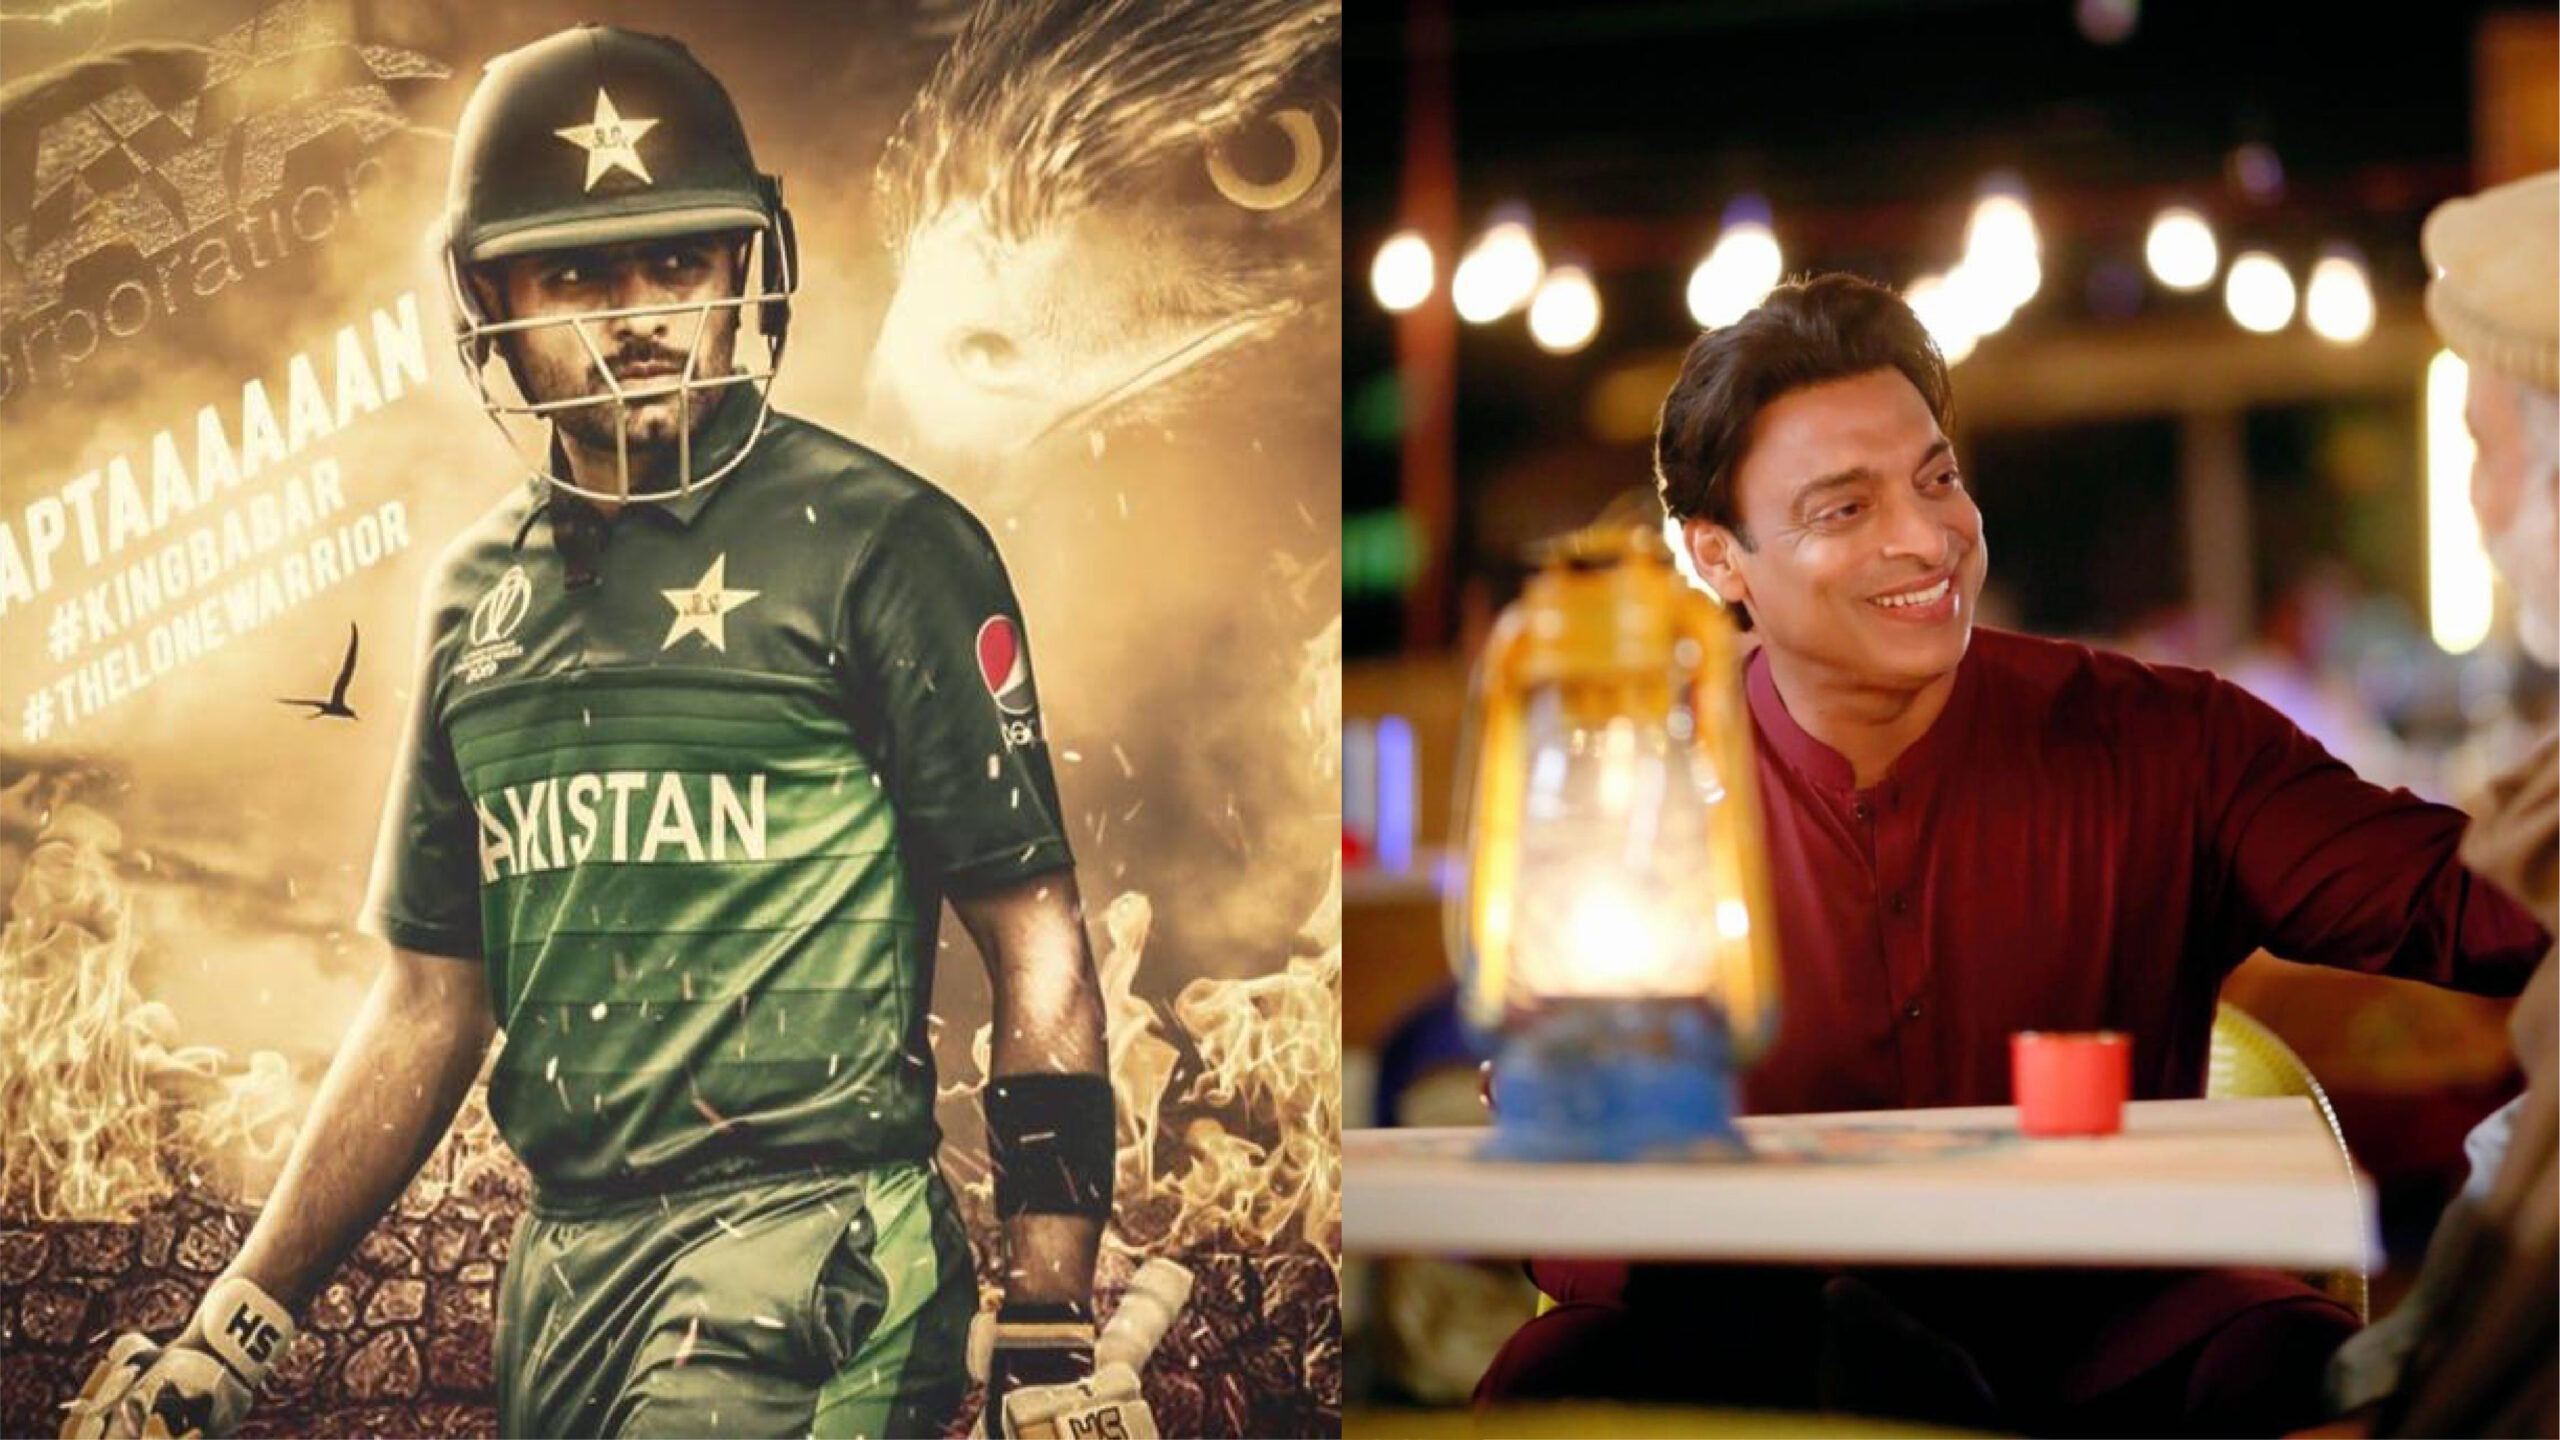 Shoaib Akhtar slammed by Twitter for criticizing Babar Azam after 2nd T20